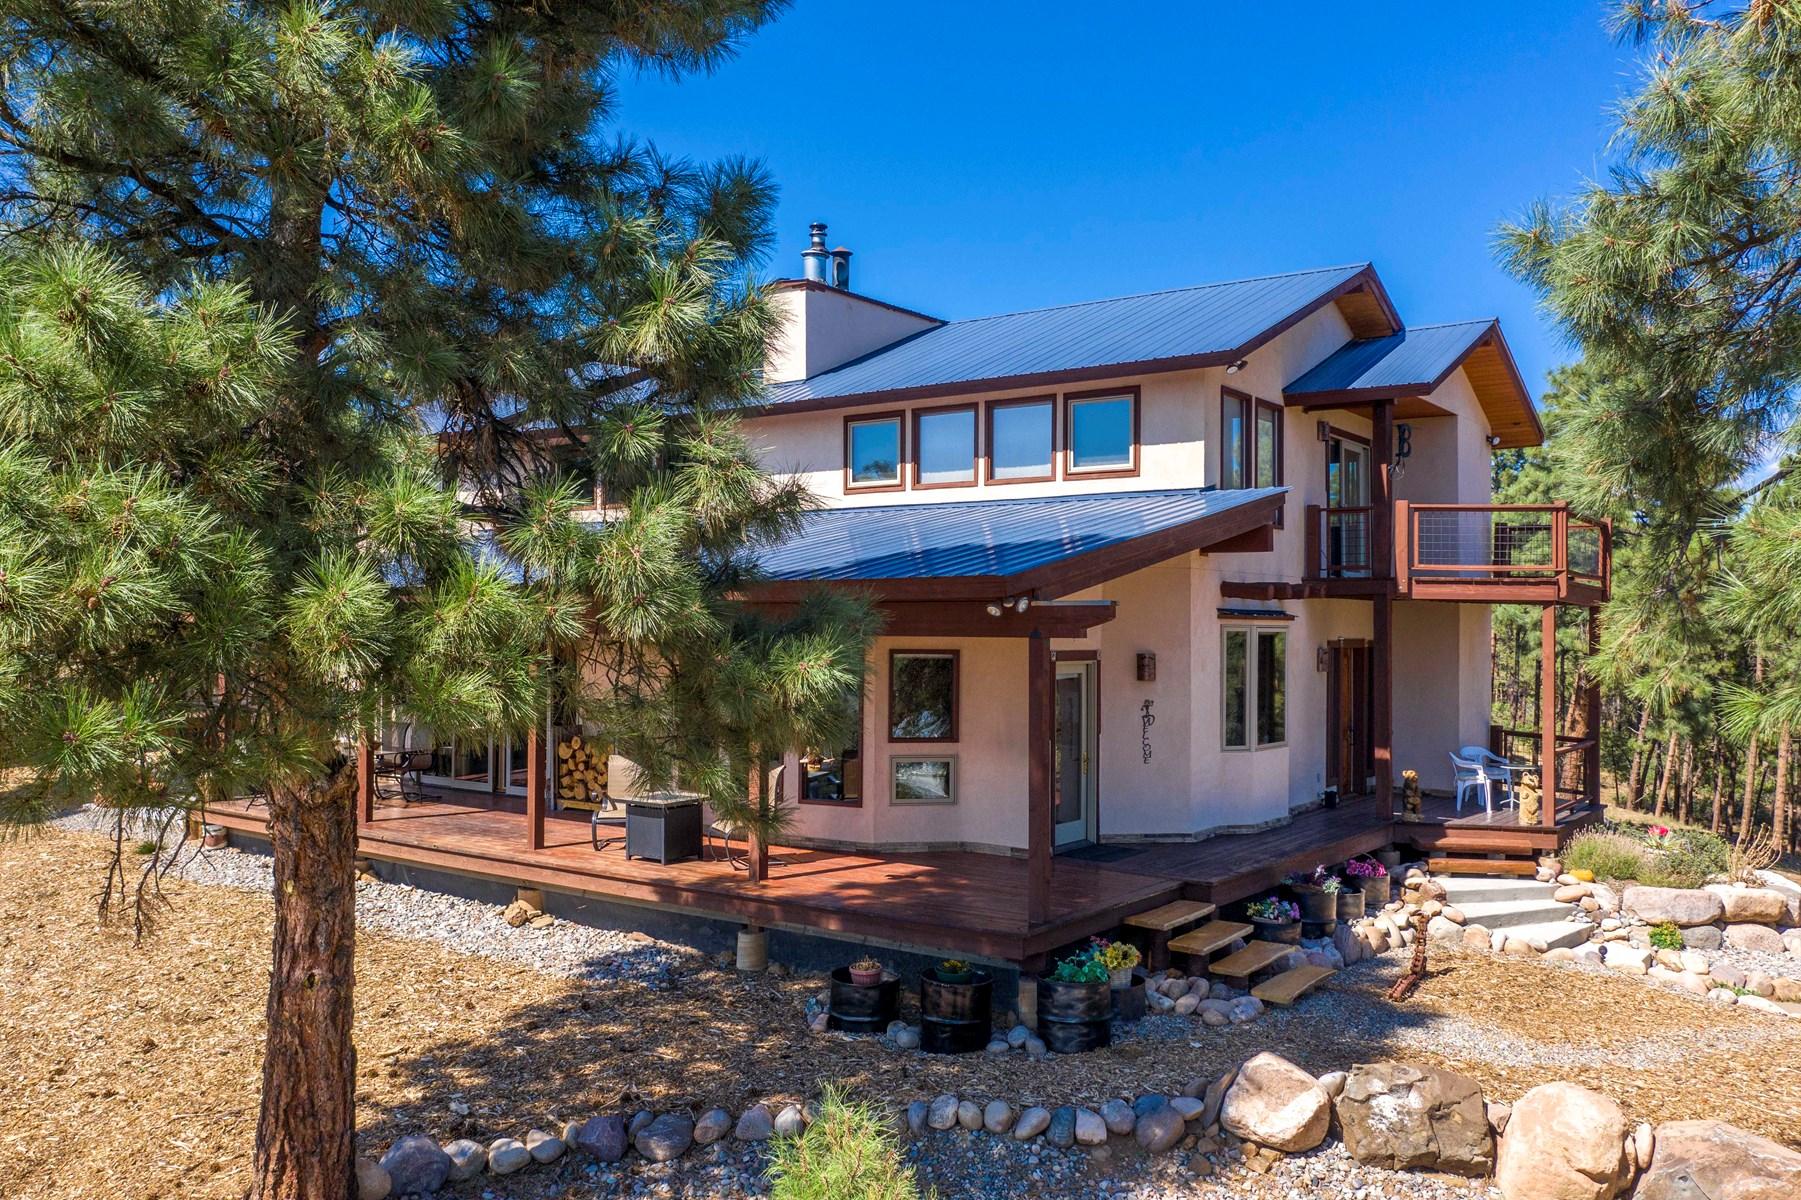 Colorado Mountain Luxury Home for Sale on Acreage